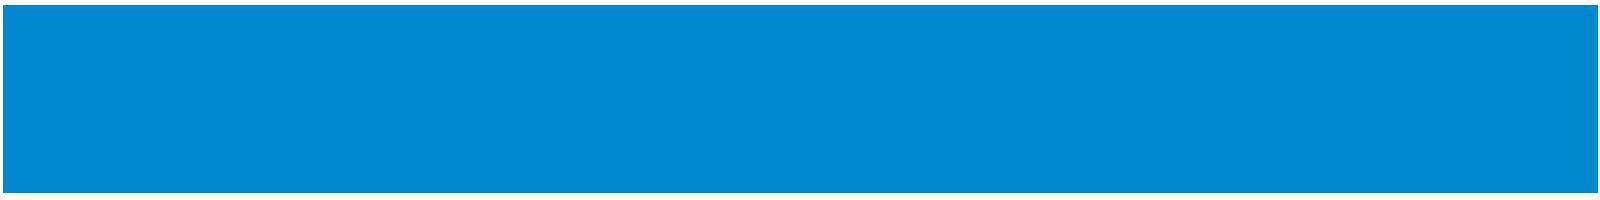 DevFacto logo